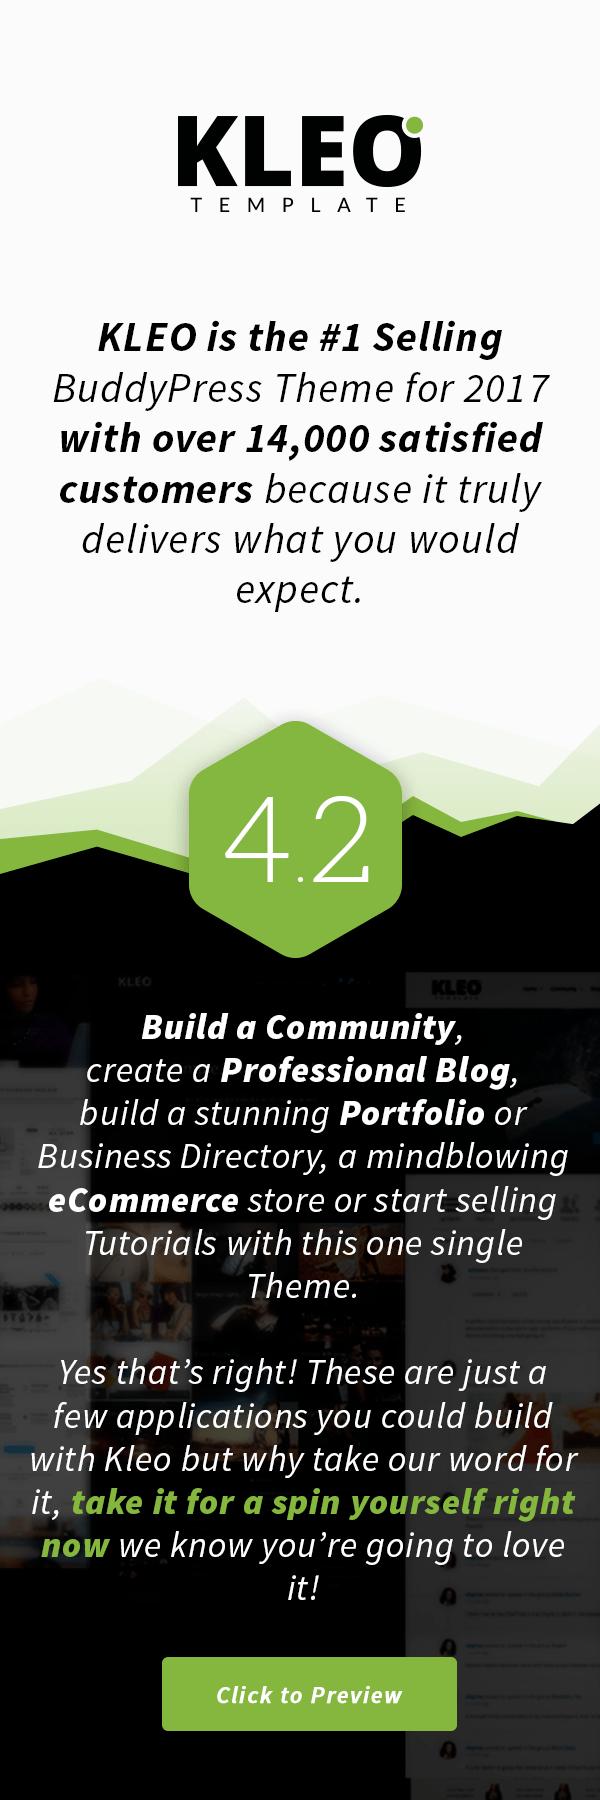 KLEO Theme Updated  Download Free KLEO 4 3 4 - Pro Community